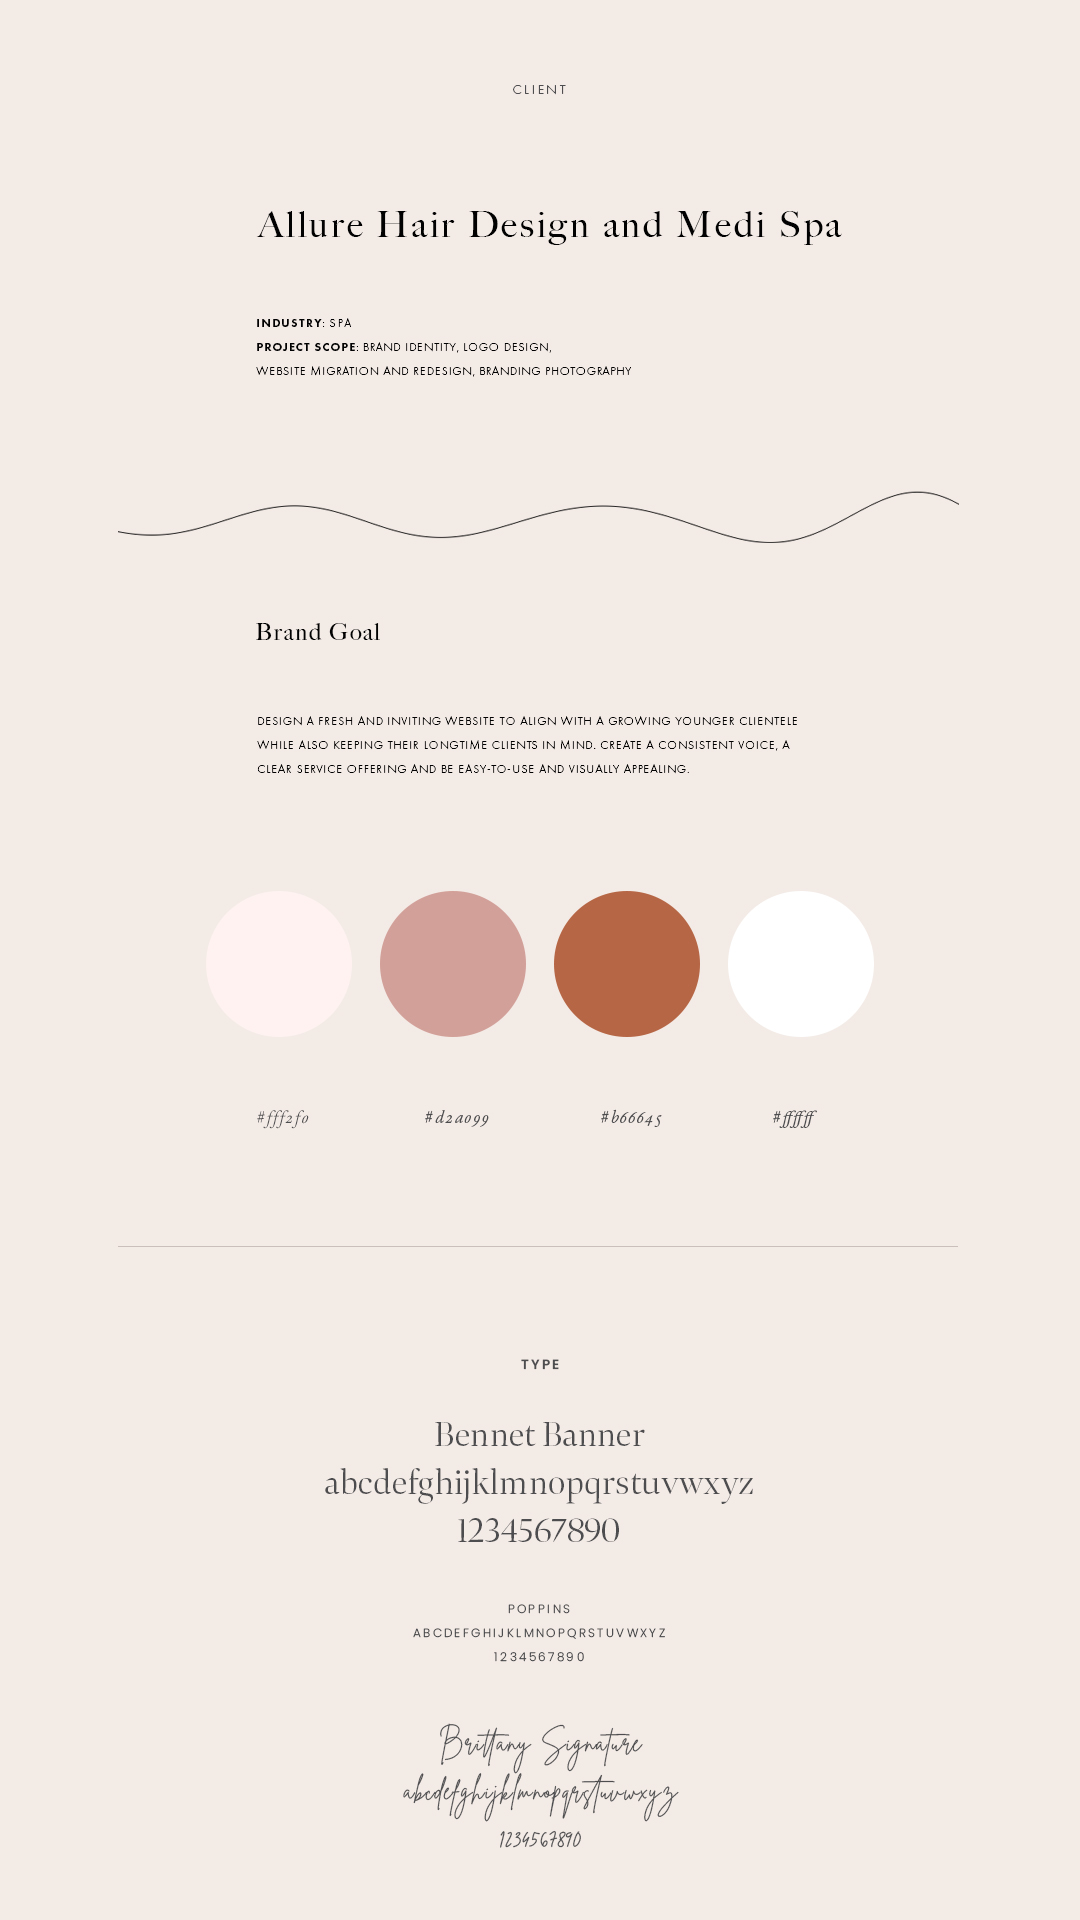 Allure Web Design Brand Goal